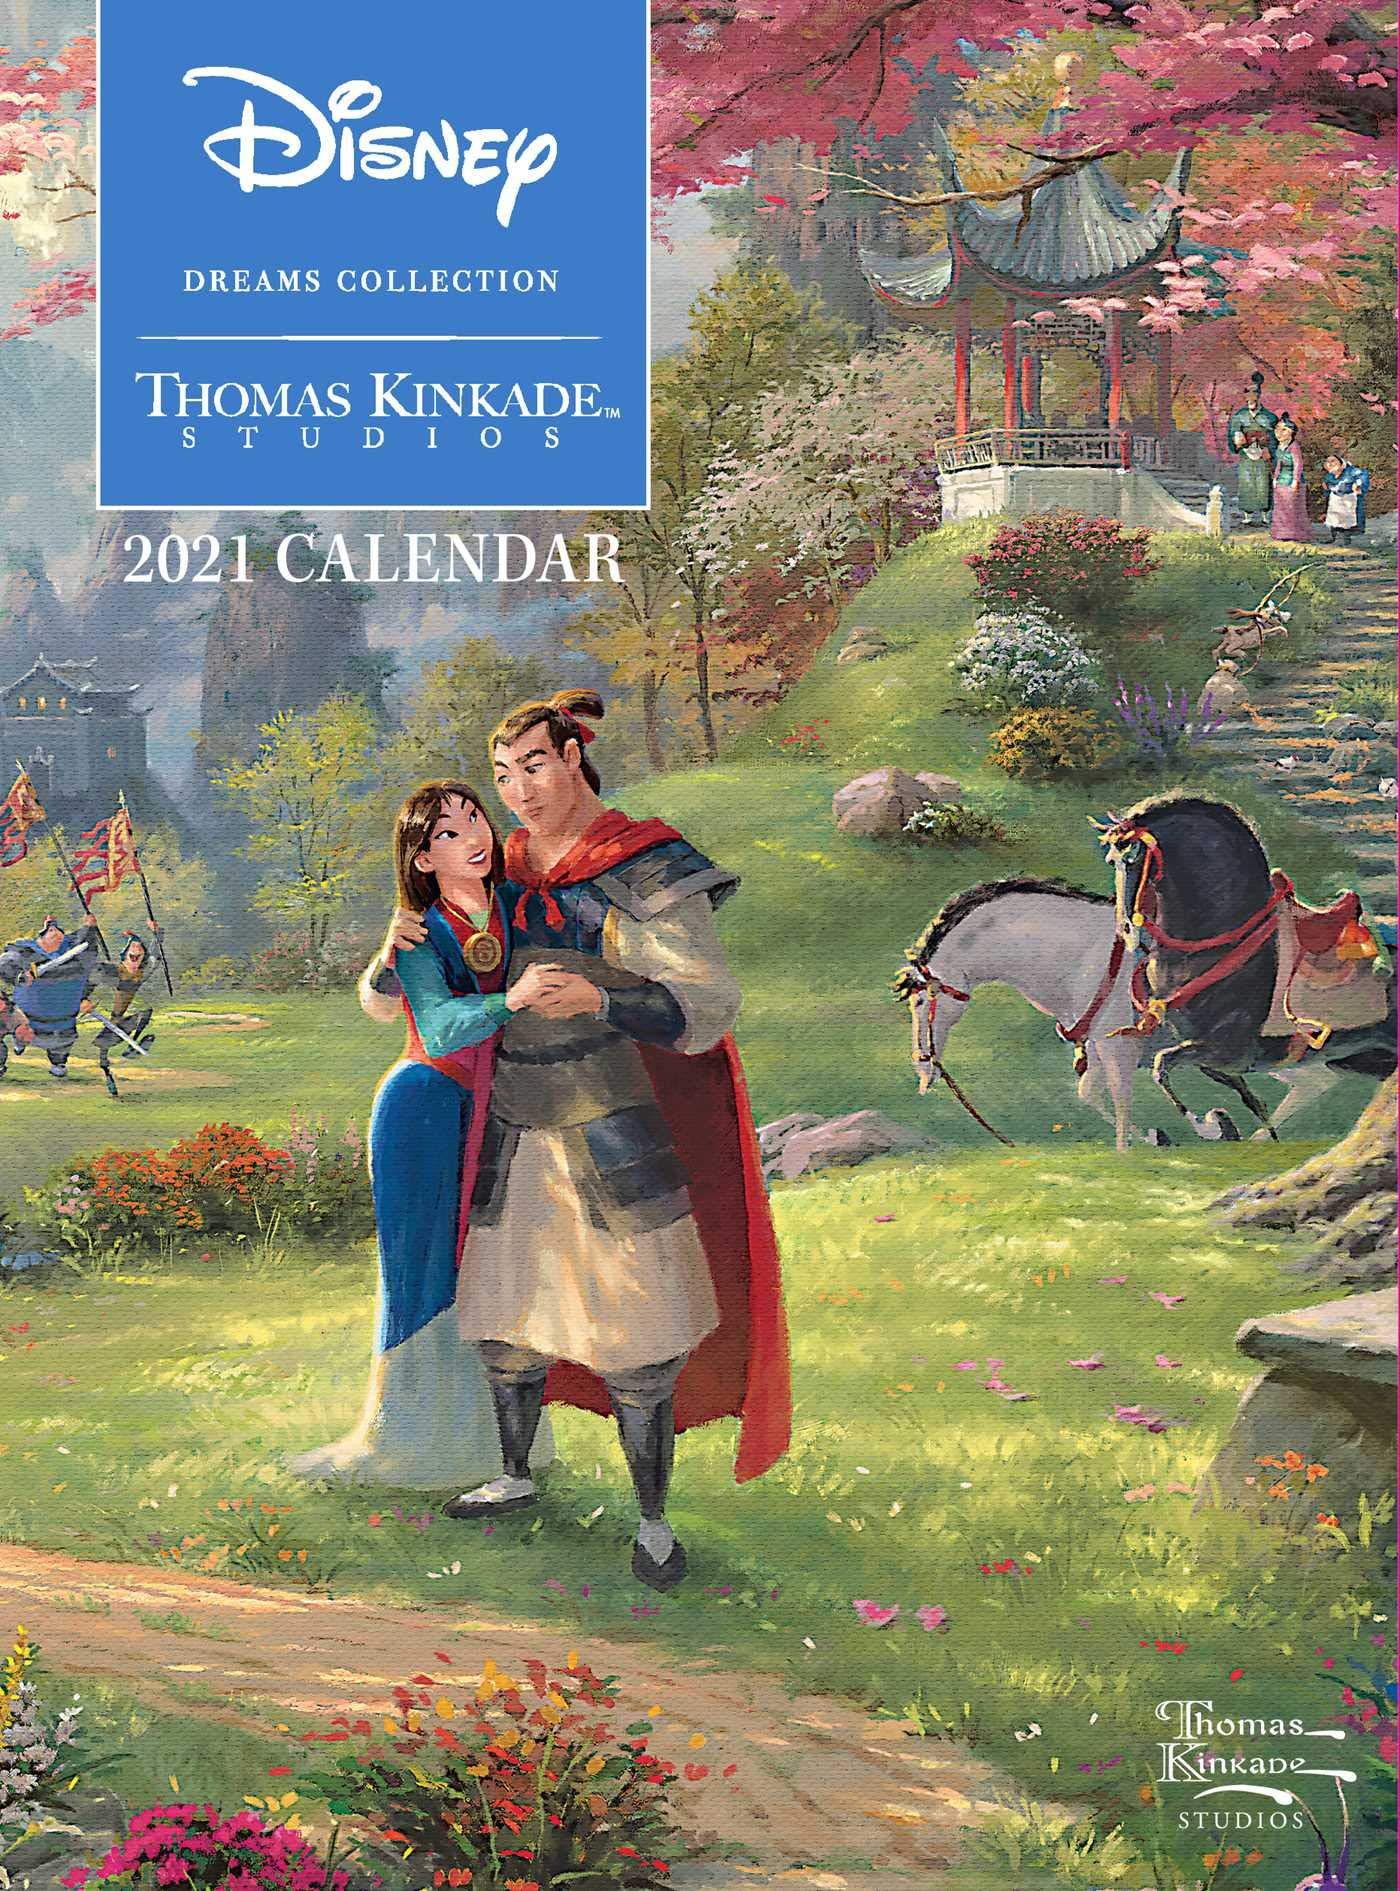 Amazon.com: Disney Dreams Collection by Thomas Kinkade Studios